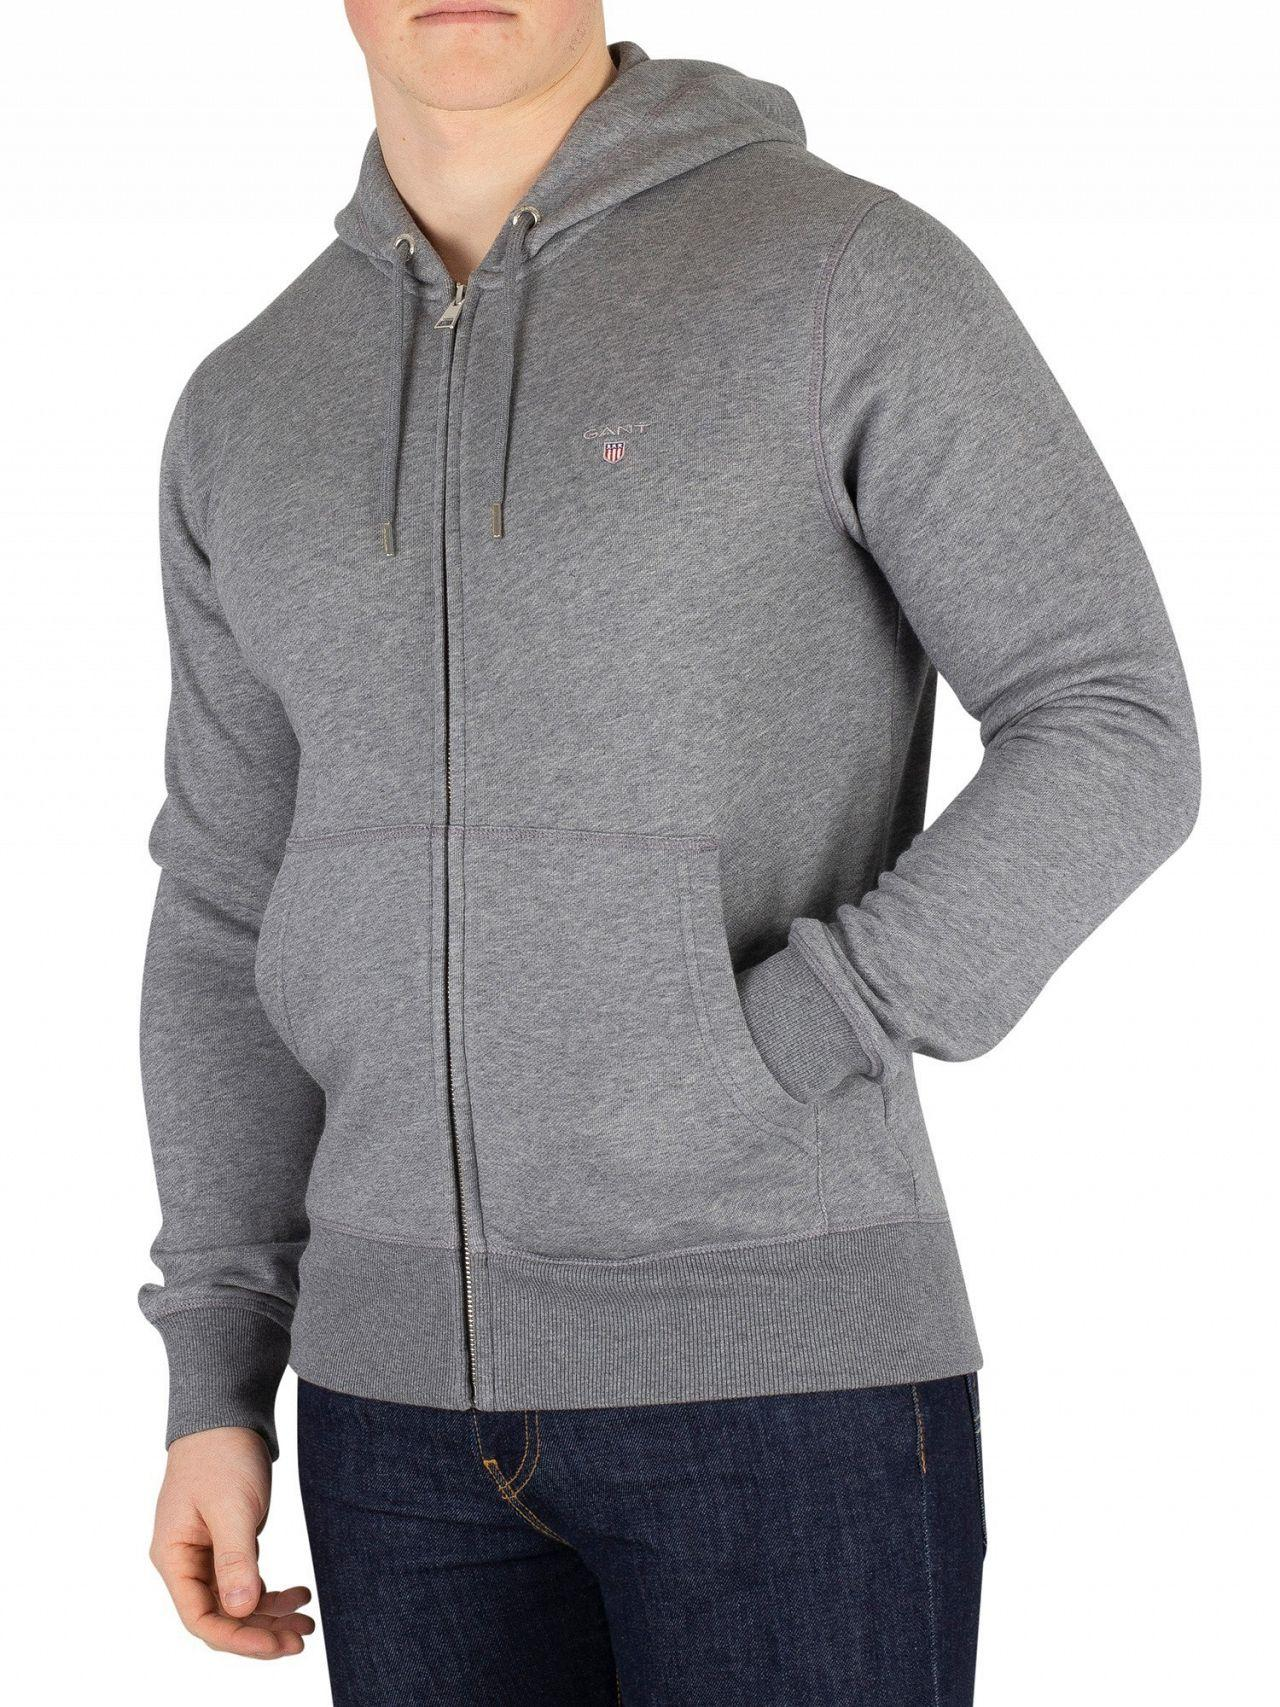 a937ba10 Lyst - GANT Dark Grey Melange Original Zip Hoodie in Gray for Men